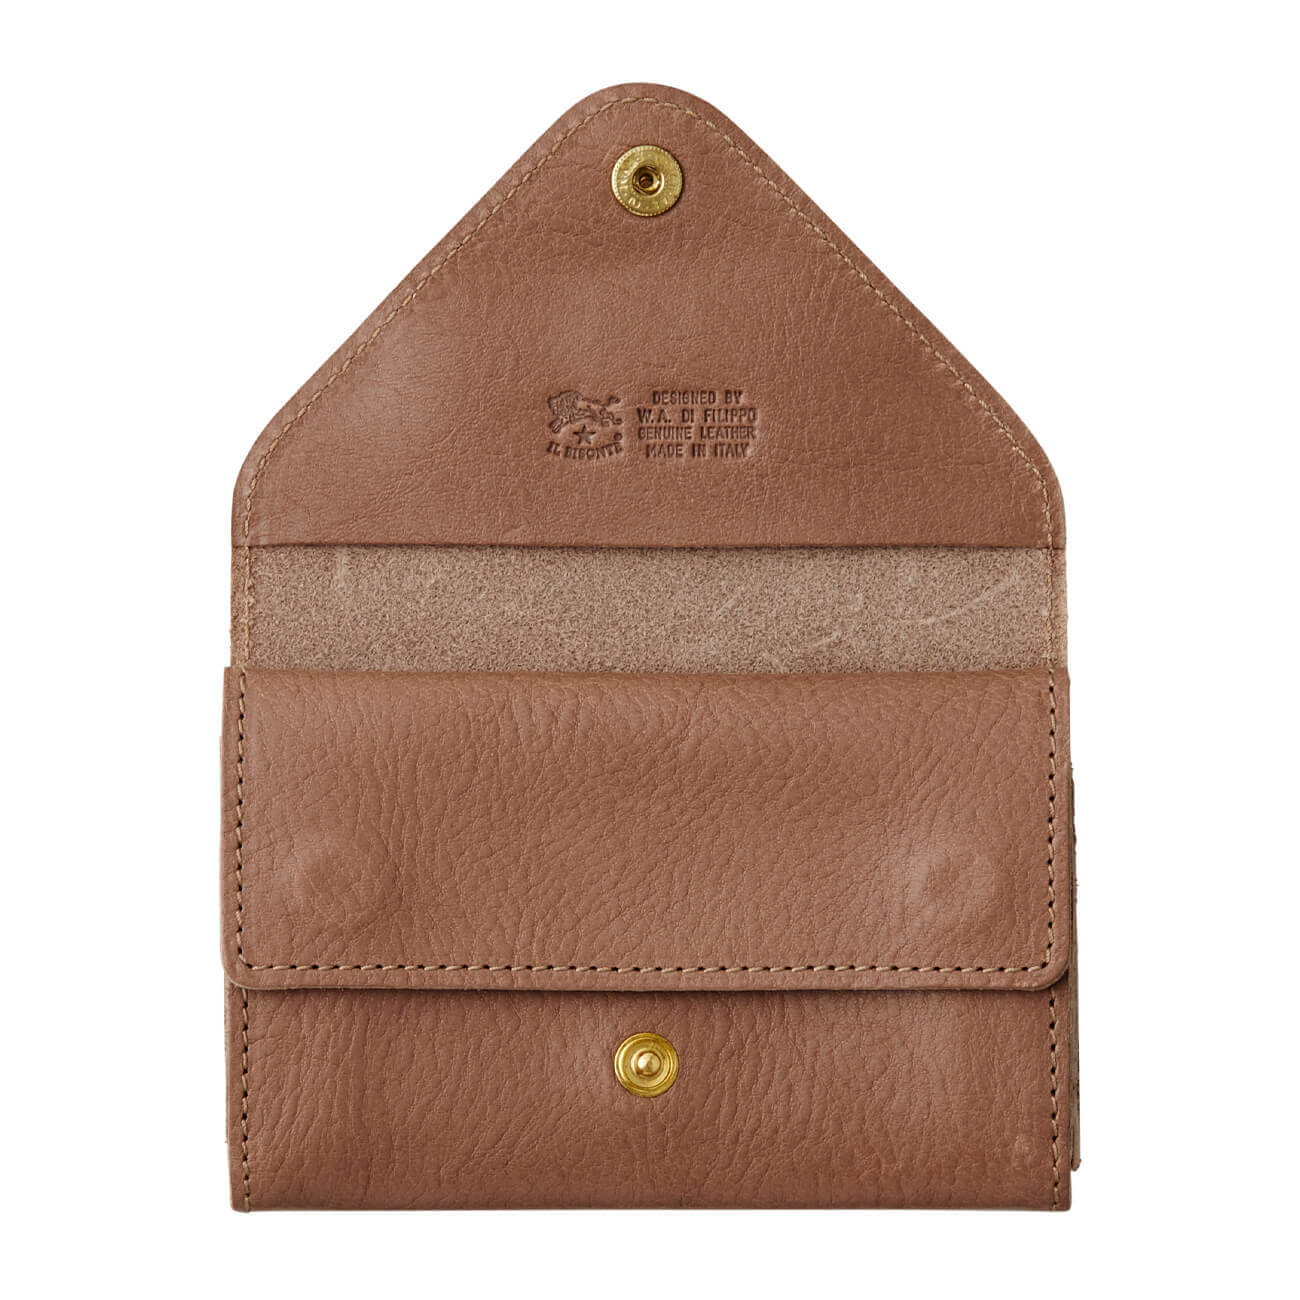 IL BISONTE (イル ビゾンテ) 日本公式オンラインストア カードケース 54192309193